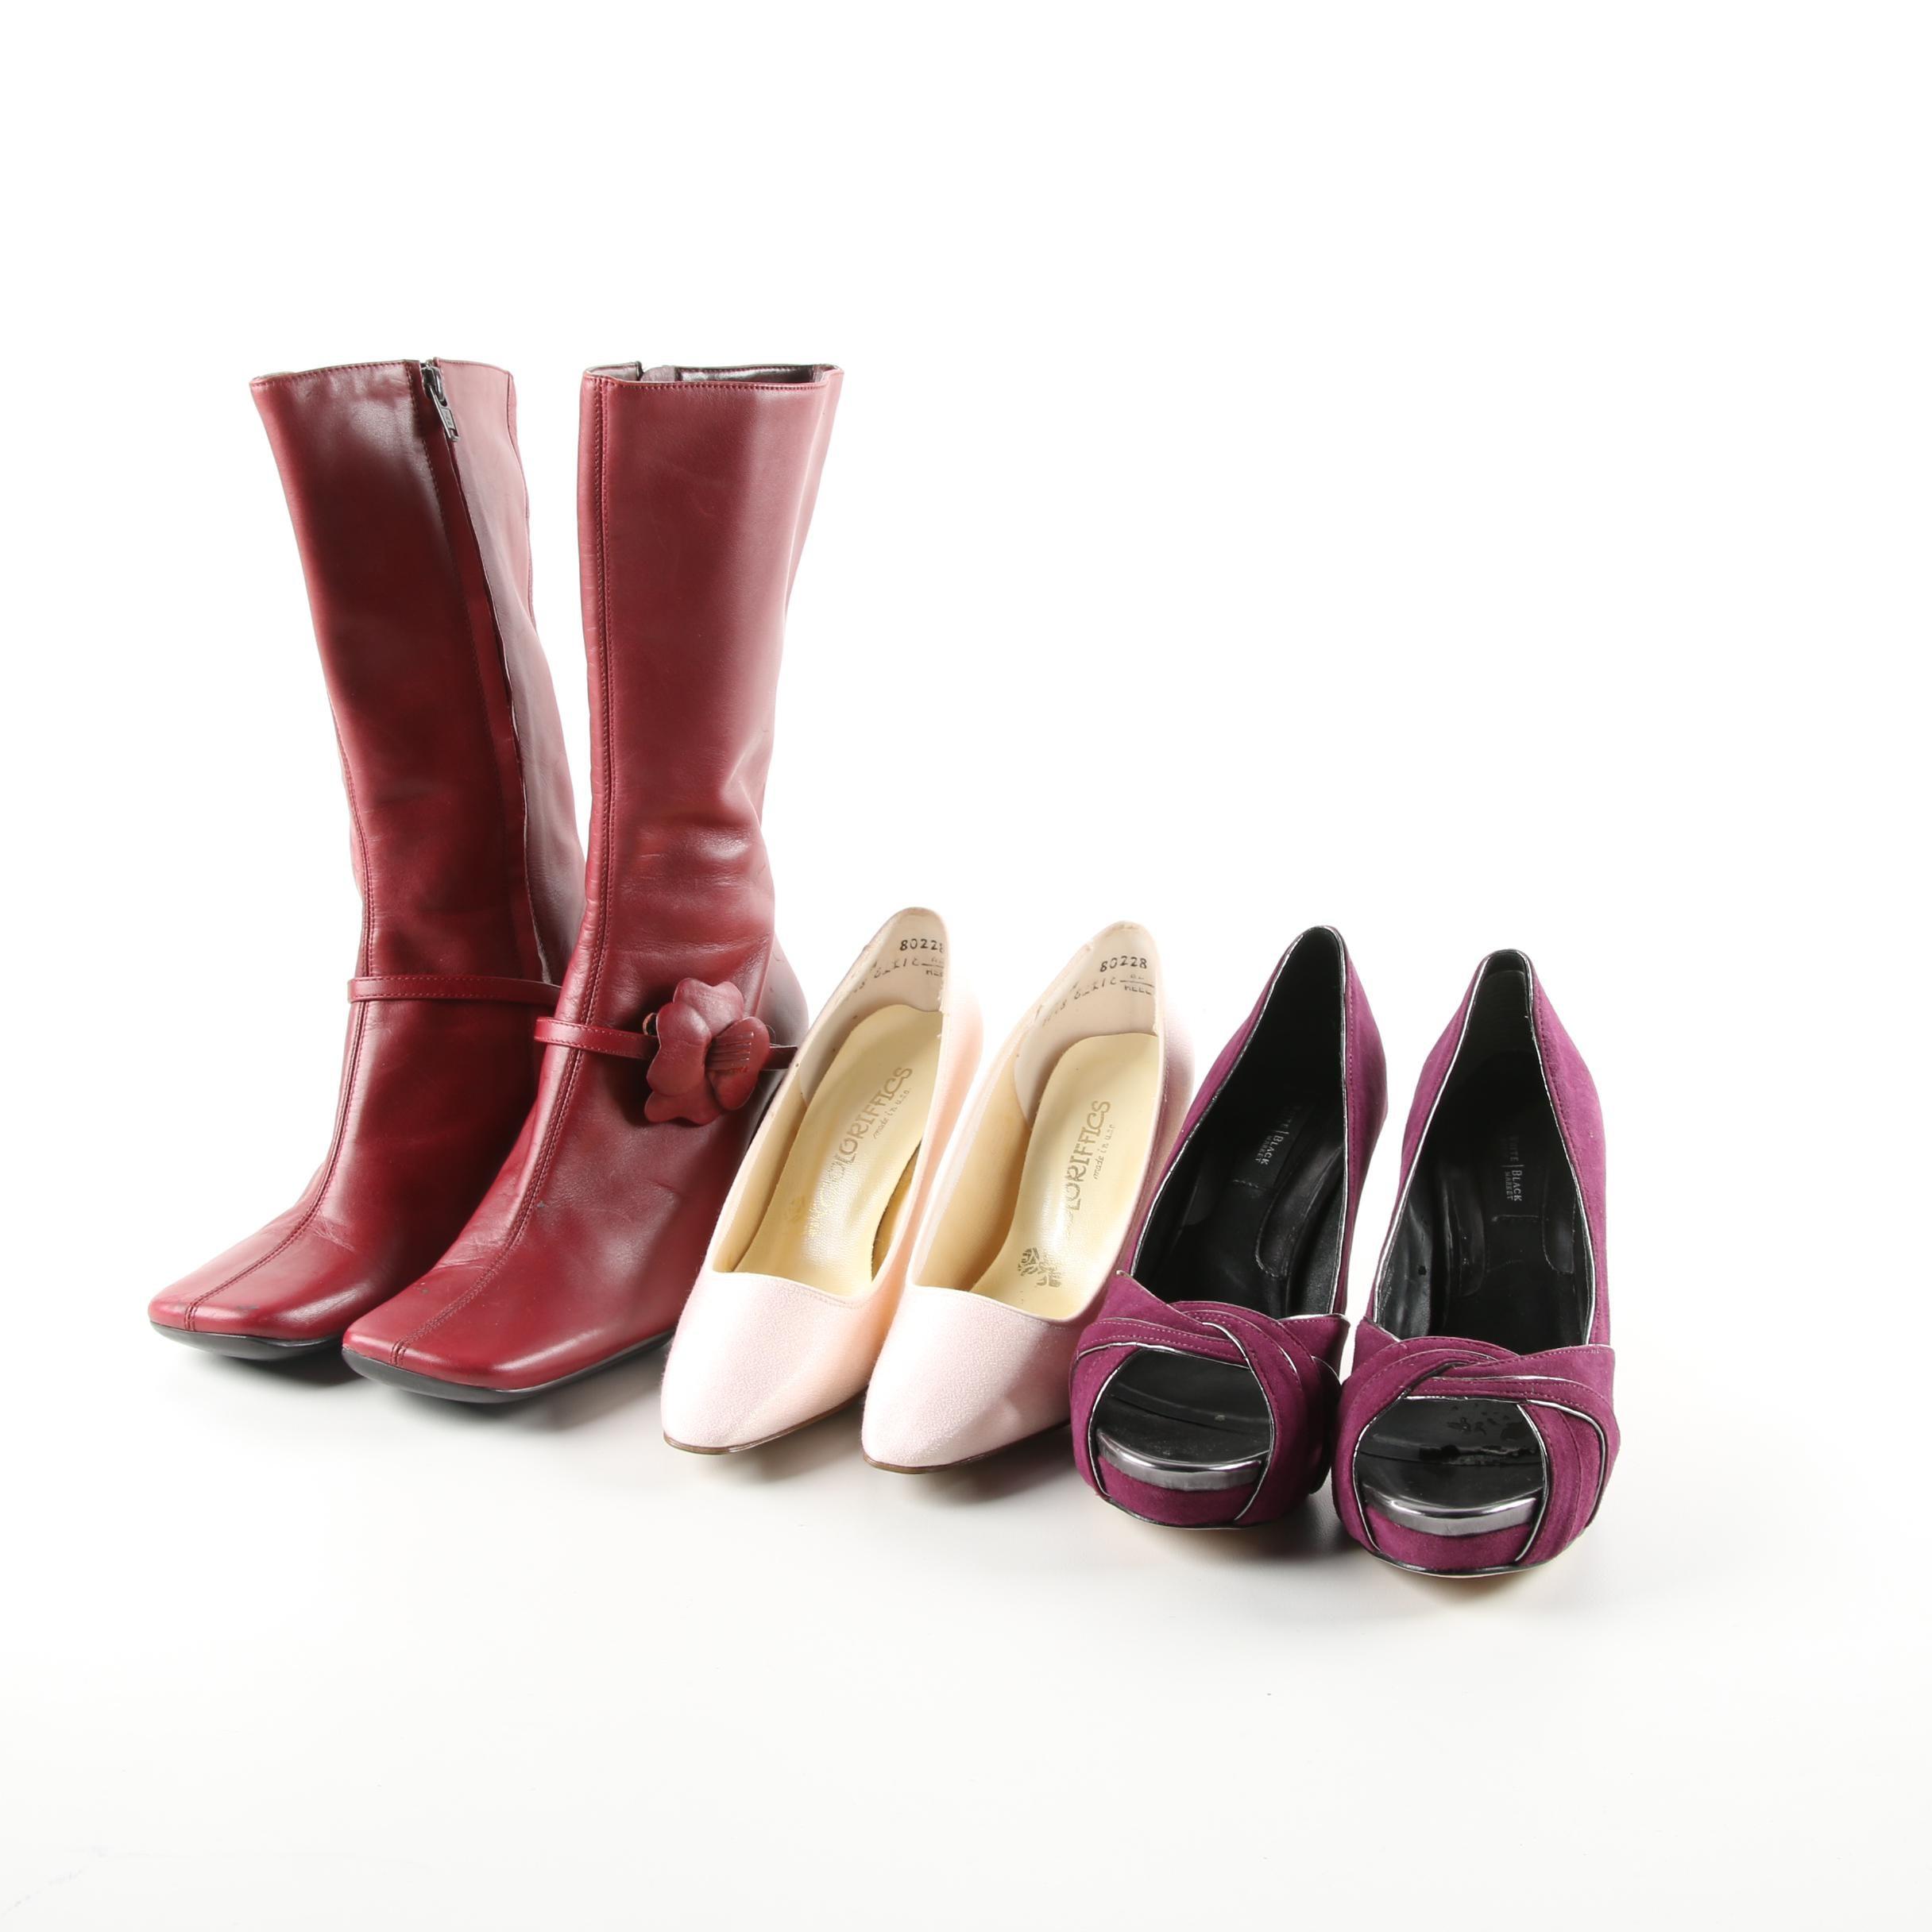 Women's Shoes Including White House Black Market Heels